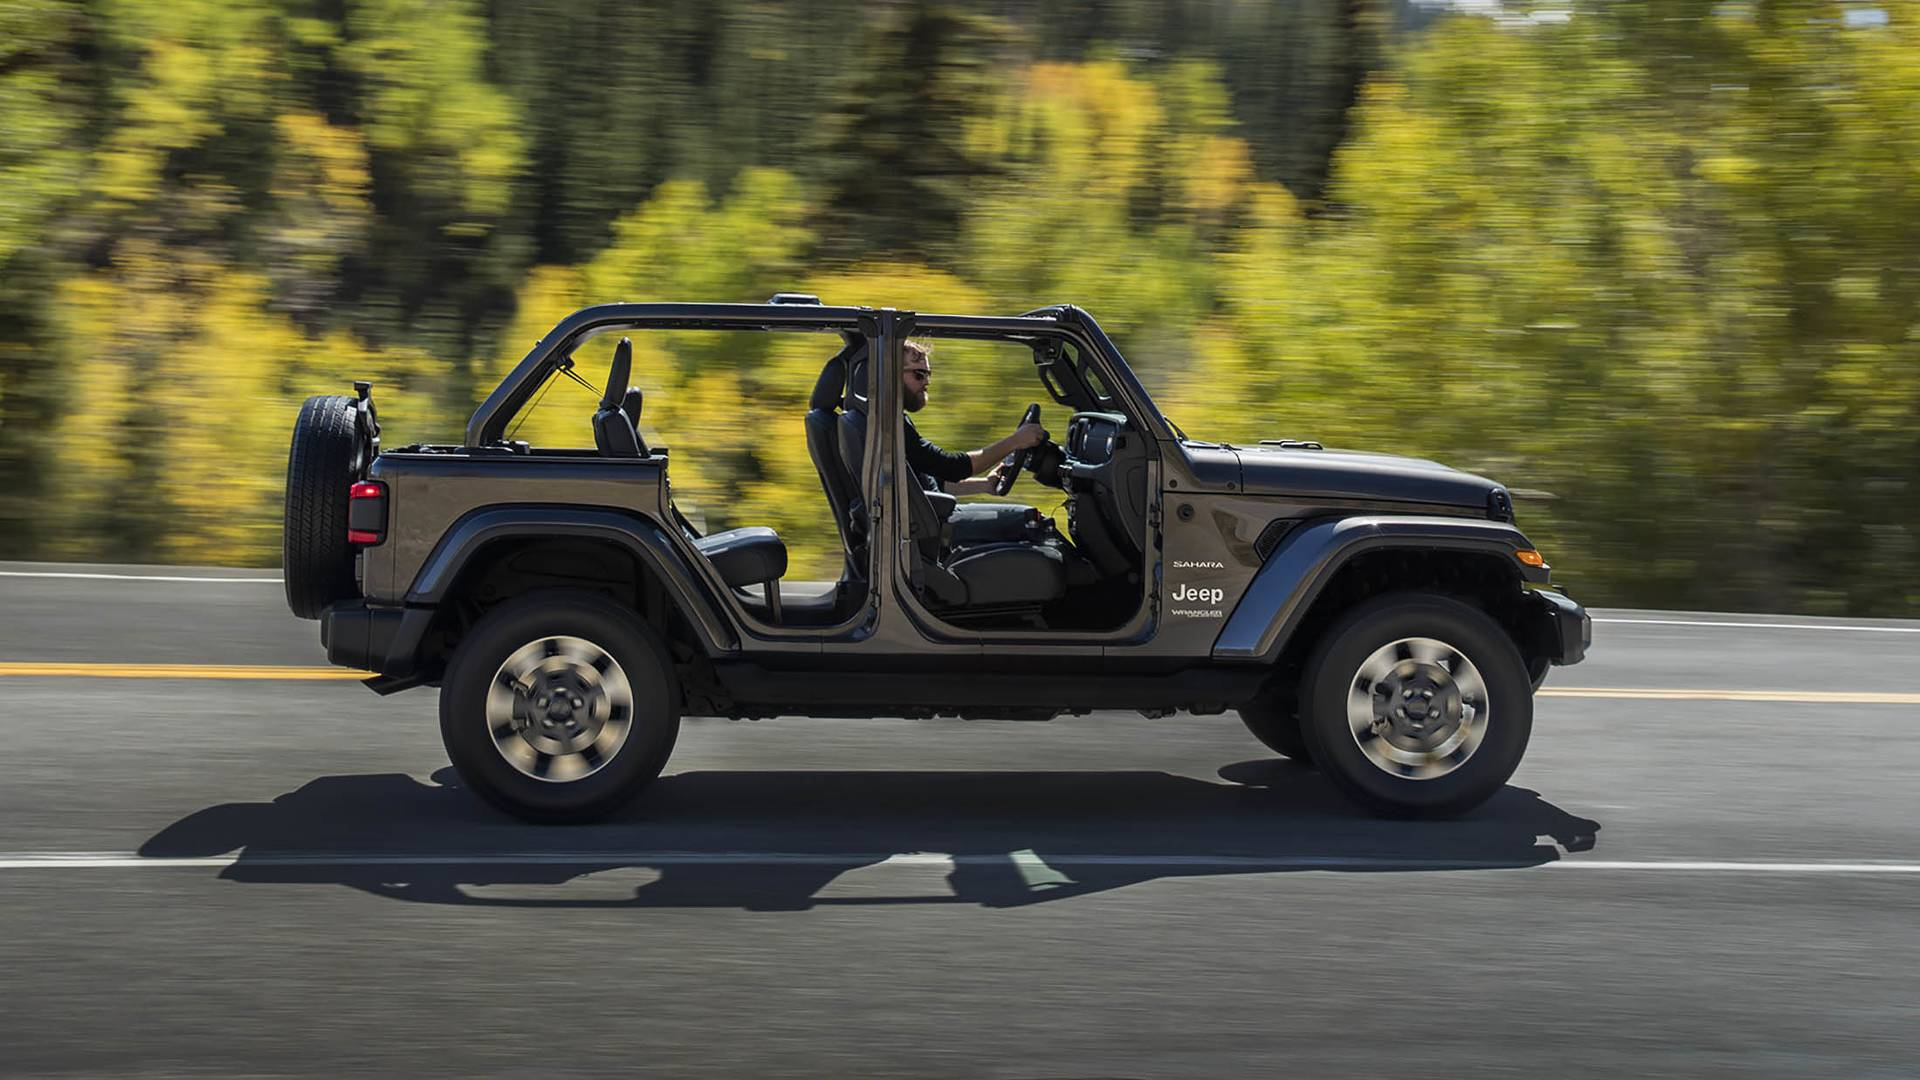 2020 Jeep Wrangler EcoDiesel Release Date >> 2020 Jeep Wrangler Gets Ecodiesel V6 Engine Etorque Mild Hybrid